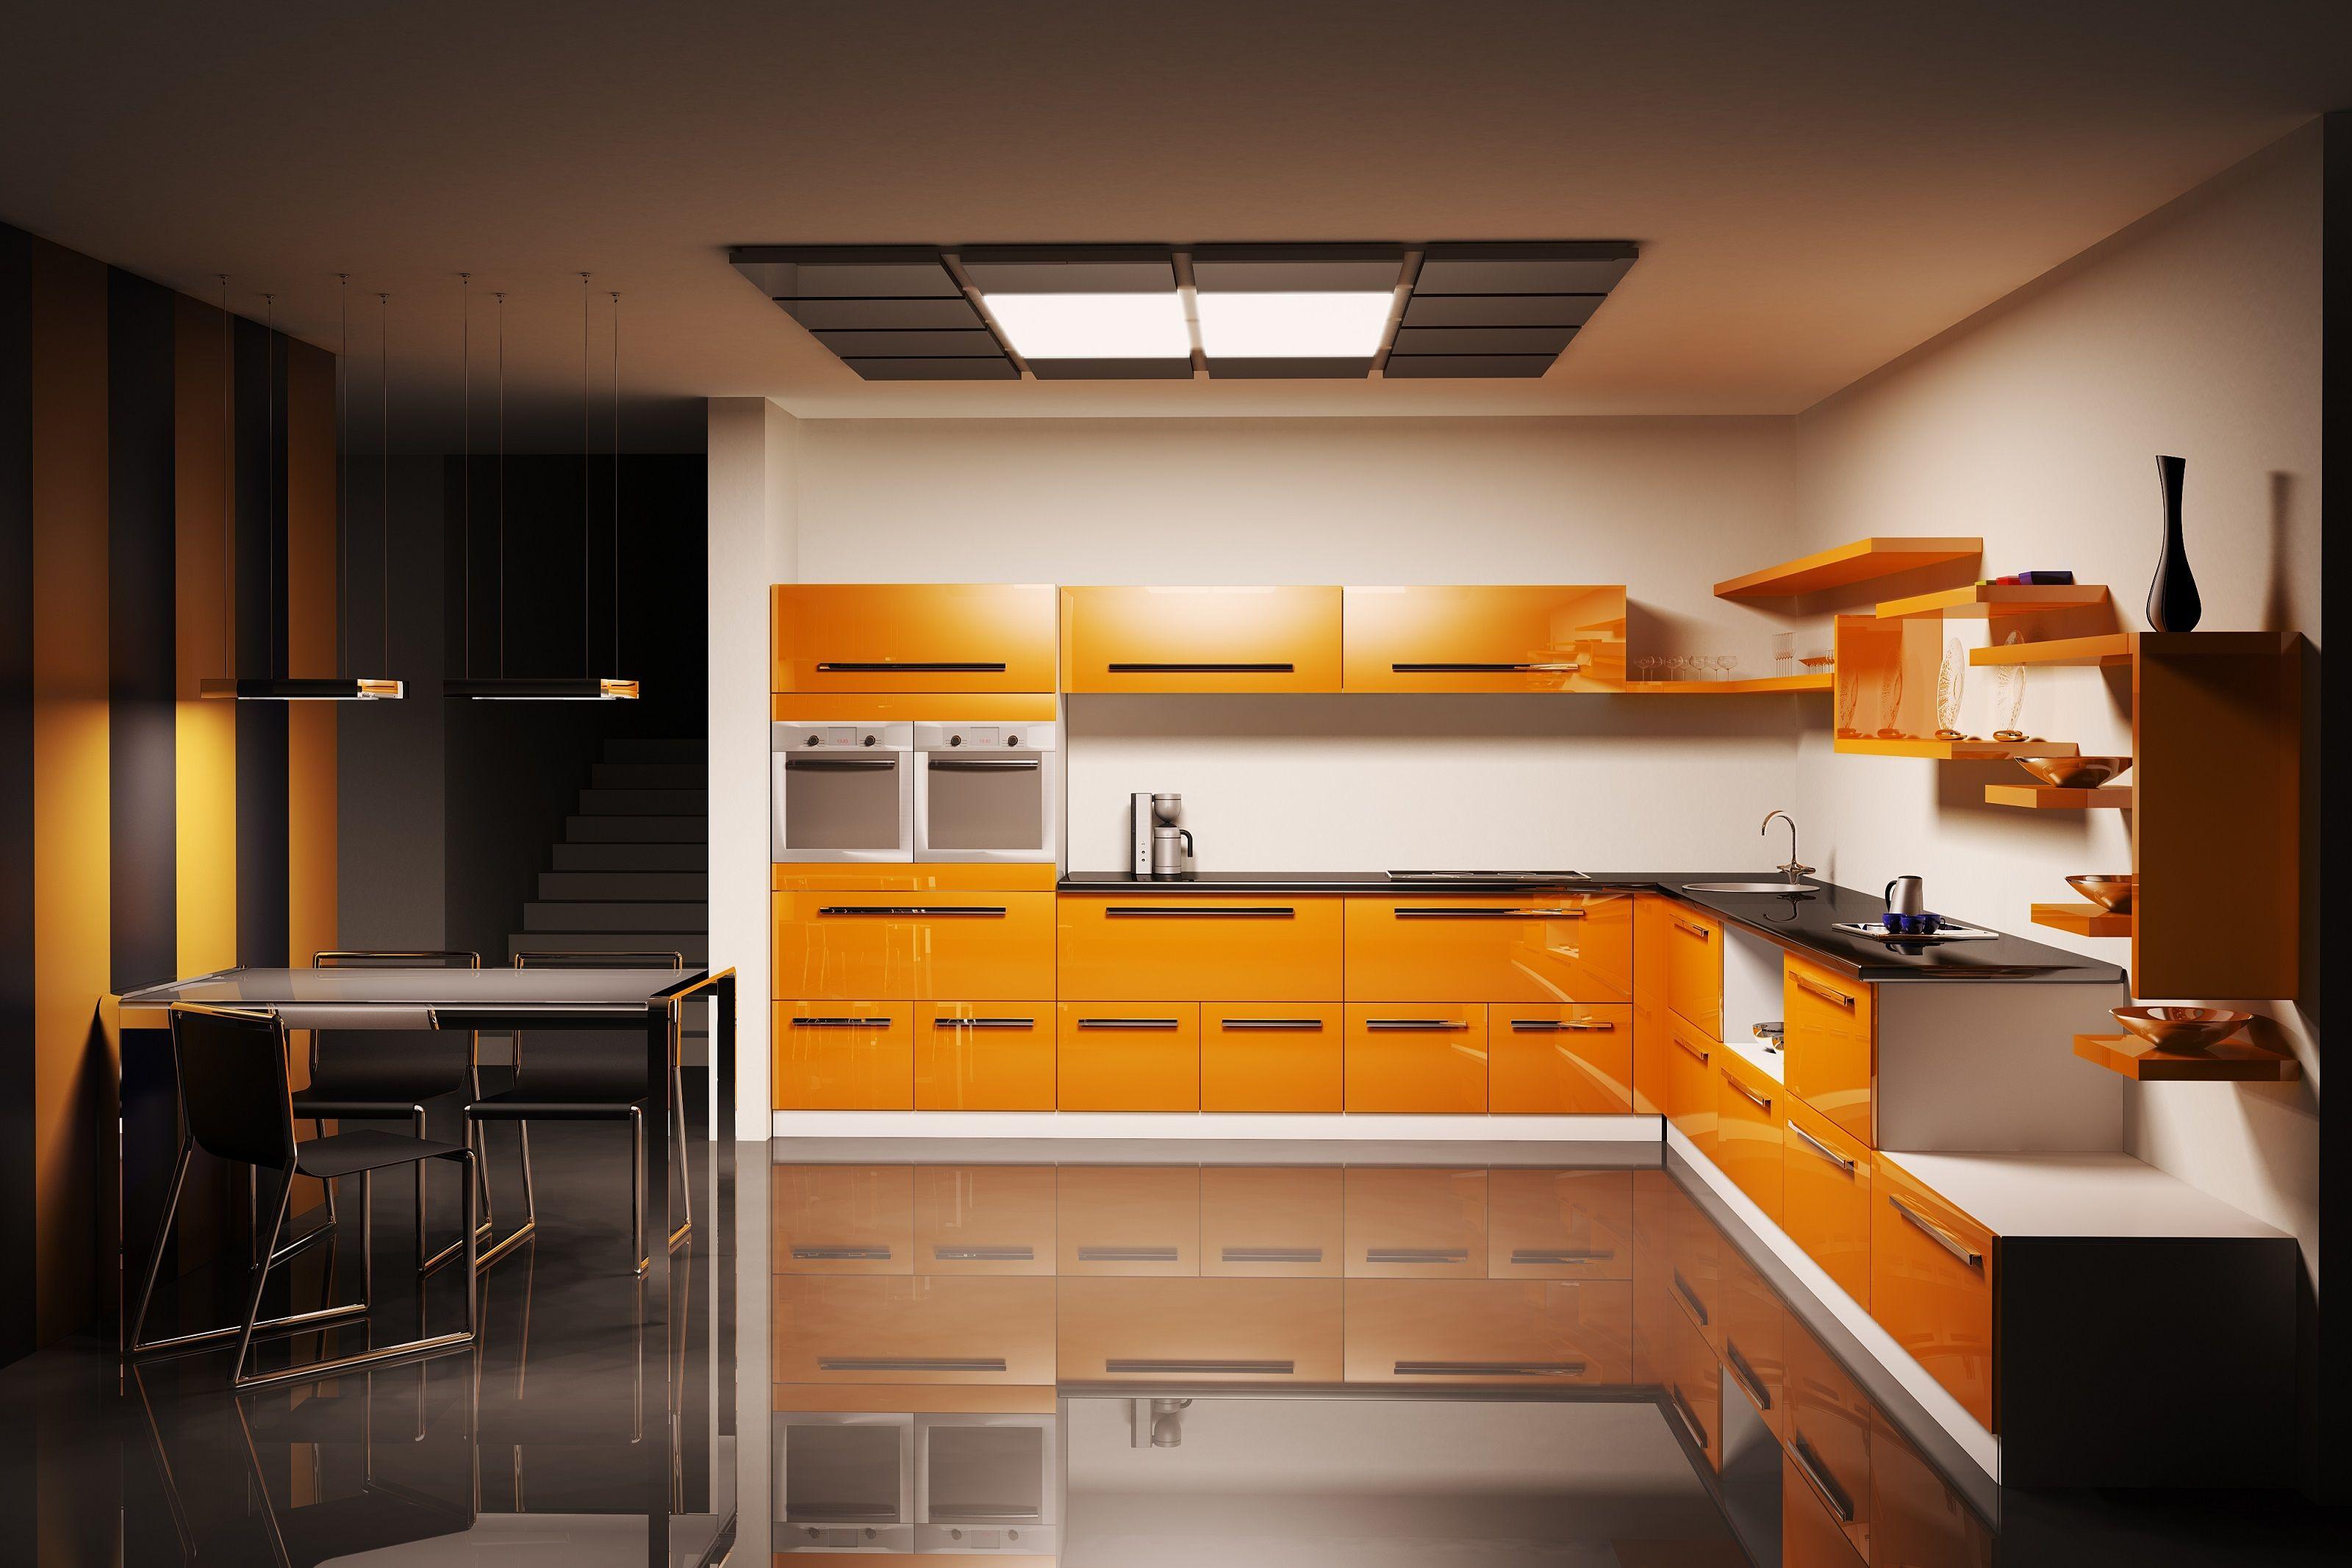 Pin By Manufaktura Dubinski On Szykowne Wnetrza 3 Glamourous Interior 3 Modern Kitchen Furniture Modern Kitchen Design Kitchen Cabinet Design